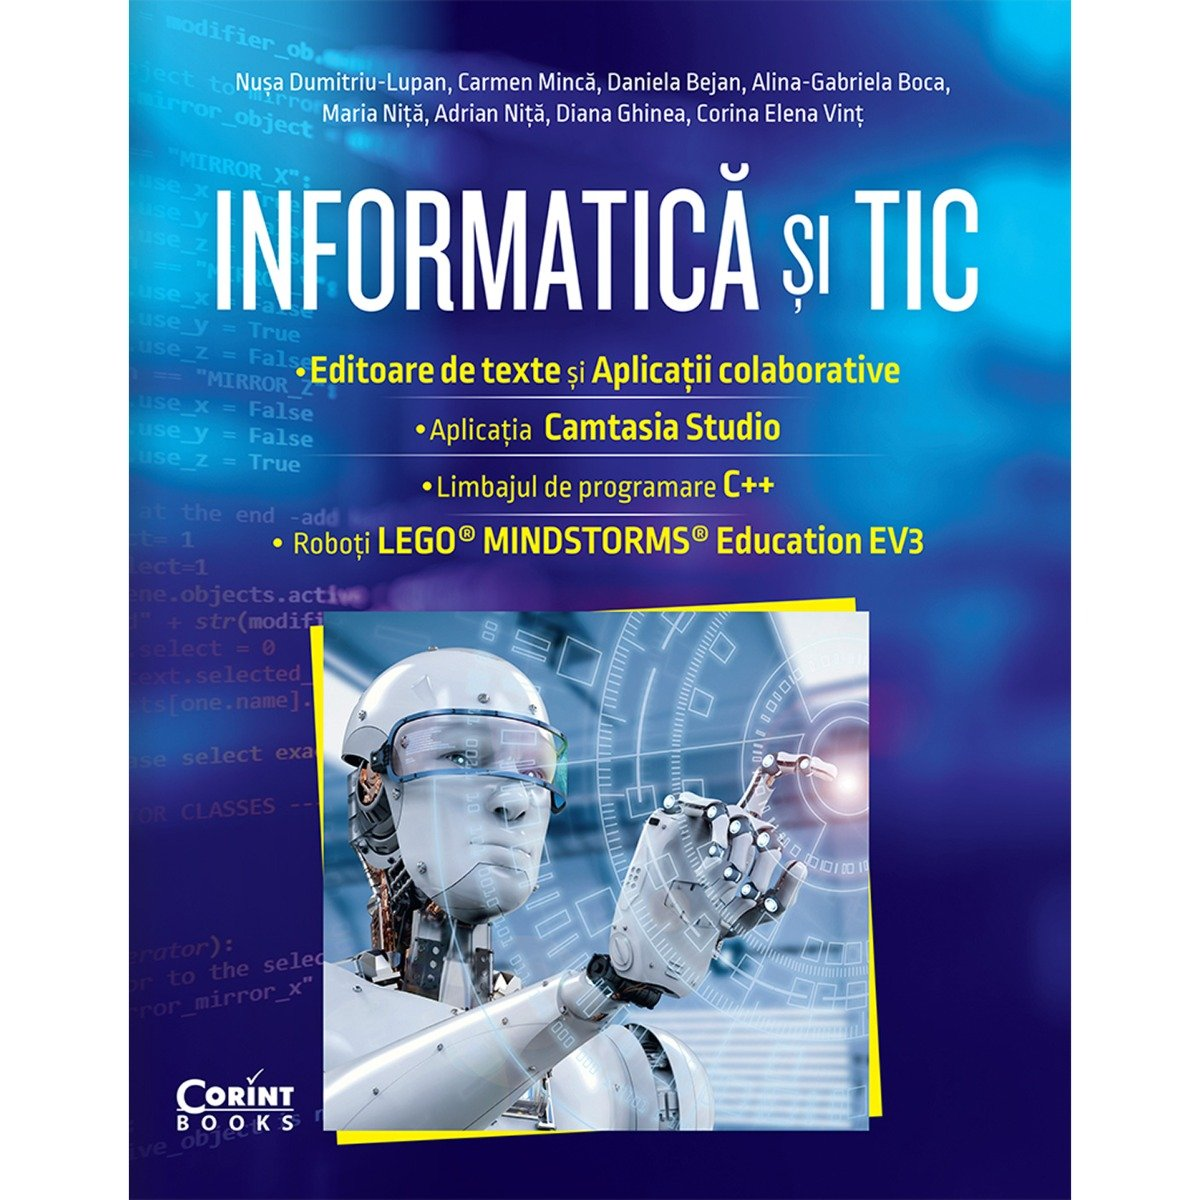 Informatica si TIC, Editoare de texte si aplicatii colaborative, Camtasia Studio, C++, Ev3, Cls. A VII-a